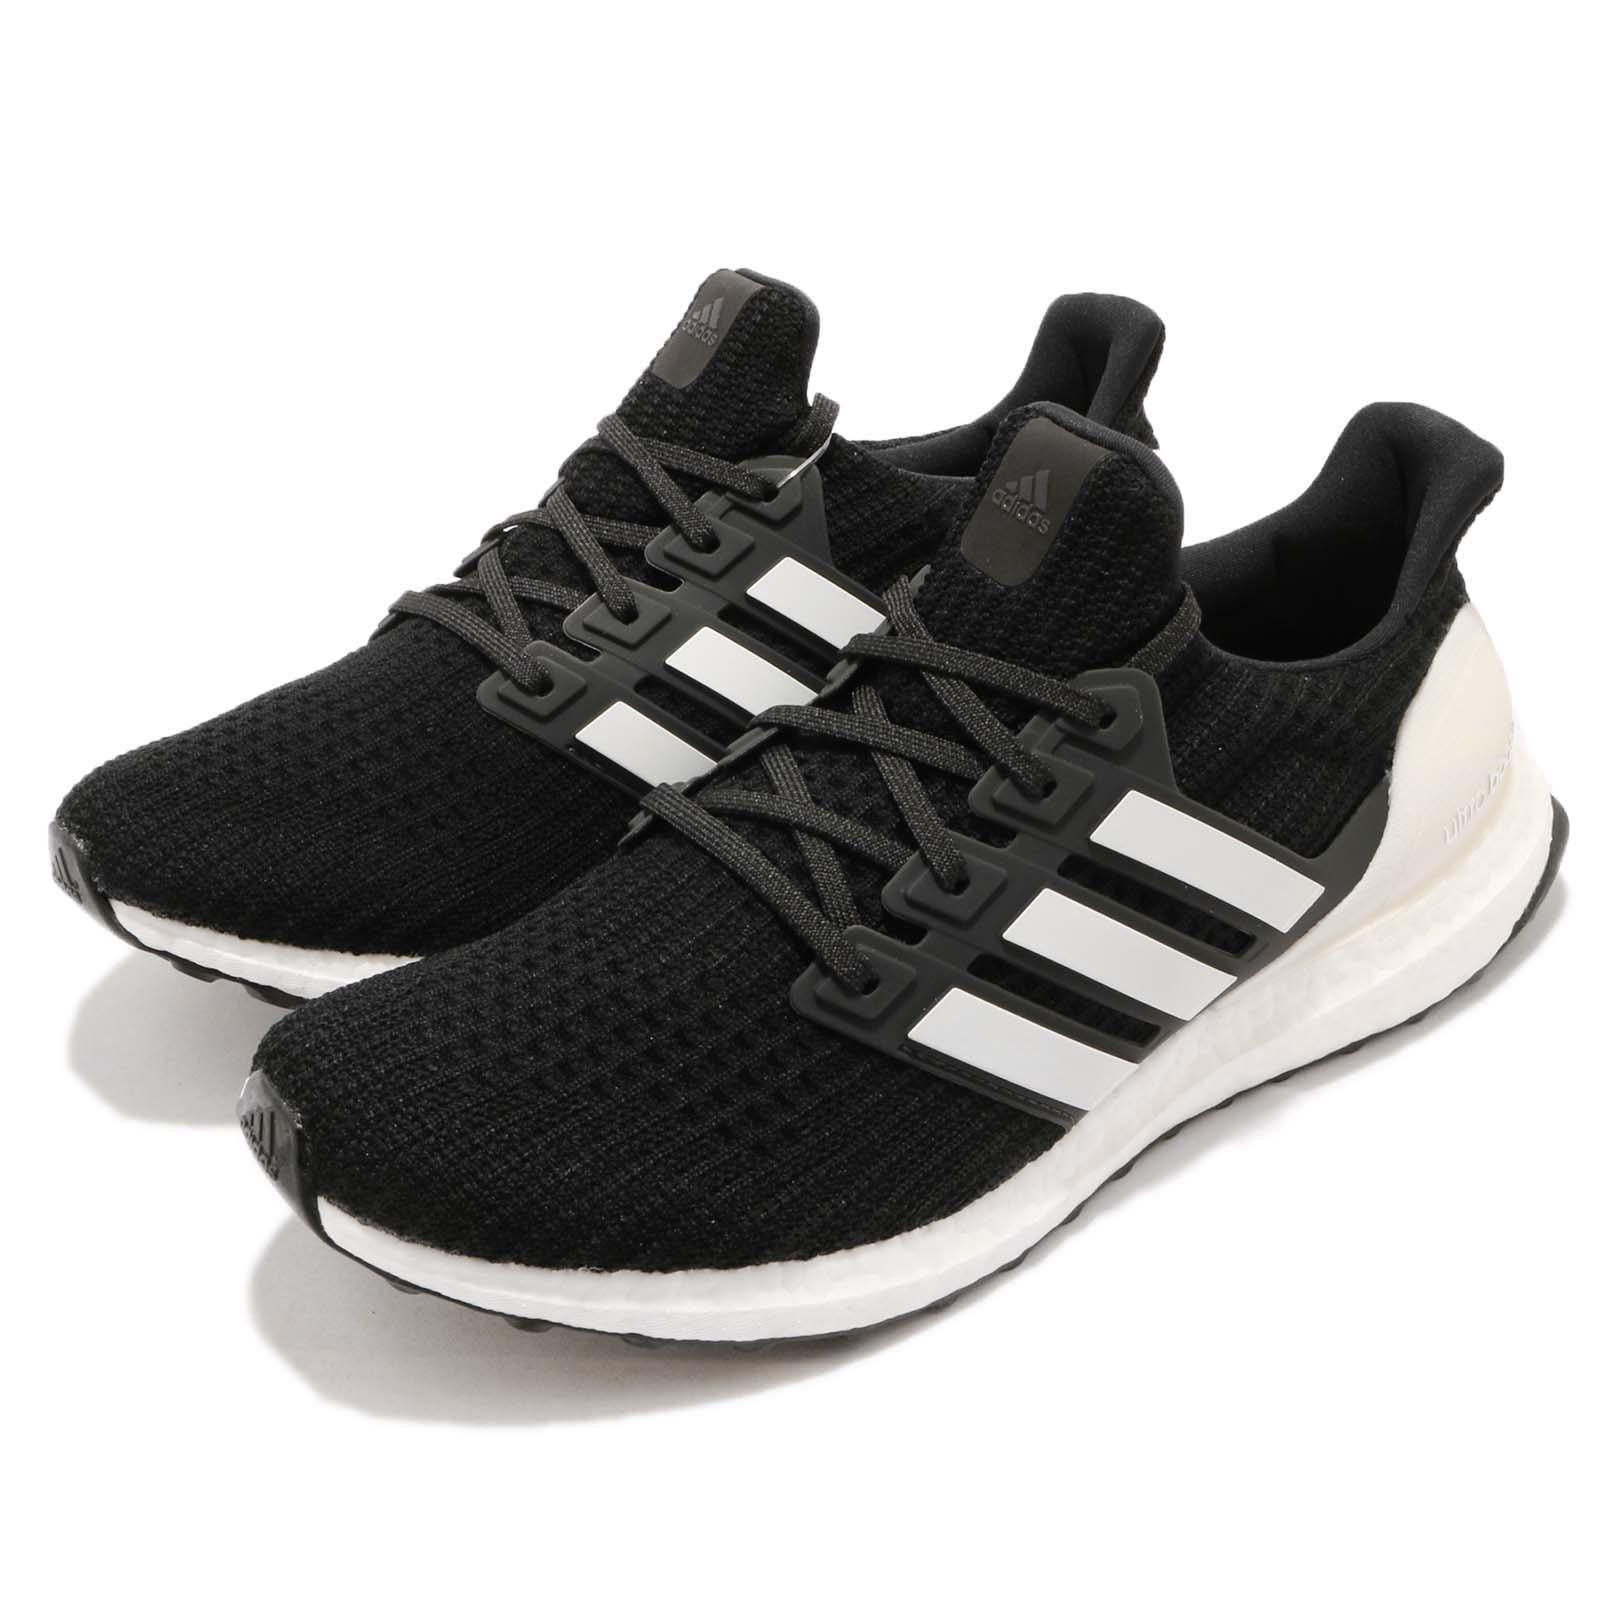 91b2a84ac1296 ADIDAS  ULTRA BOOST 黑白休閒鞋慢跑鞋男訂價5990 AQ0062 (Palace store ...